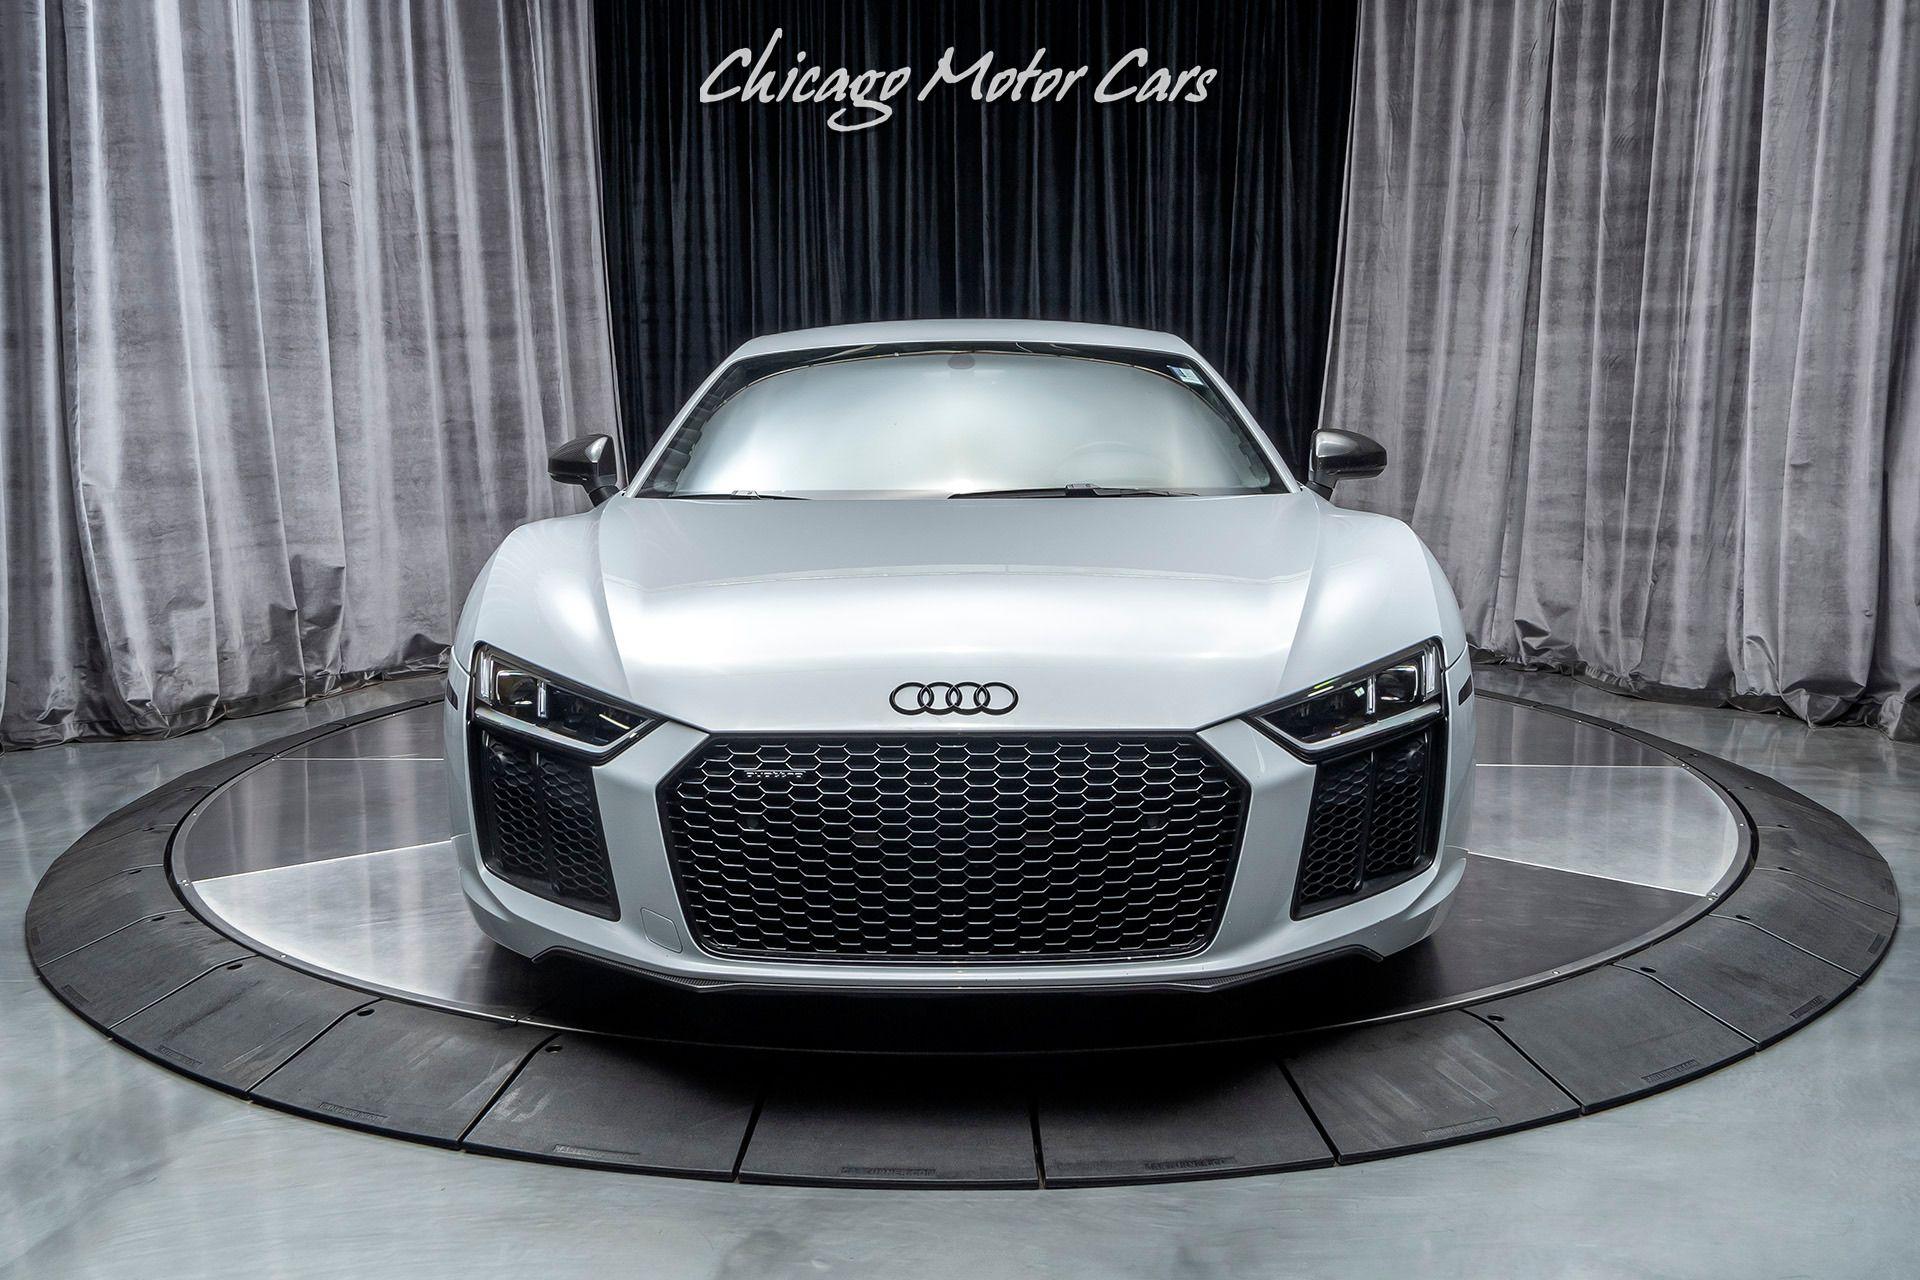 2017 Audi R8 5 2 Quattro V10 Plus Msrp Chicago Motor Cars United States For Sale On Luxurypulse Audi Audi R8 Super Cars